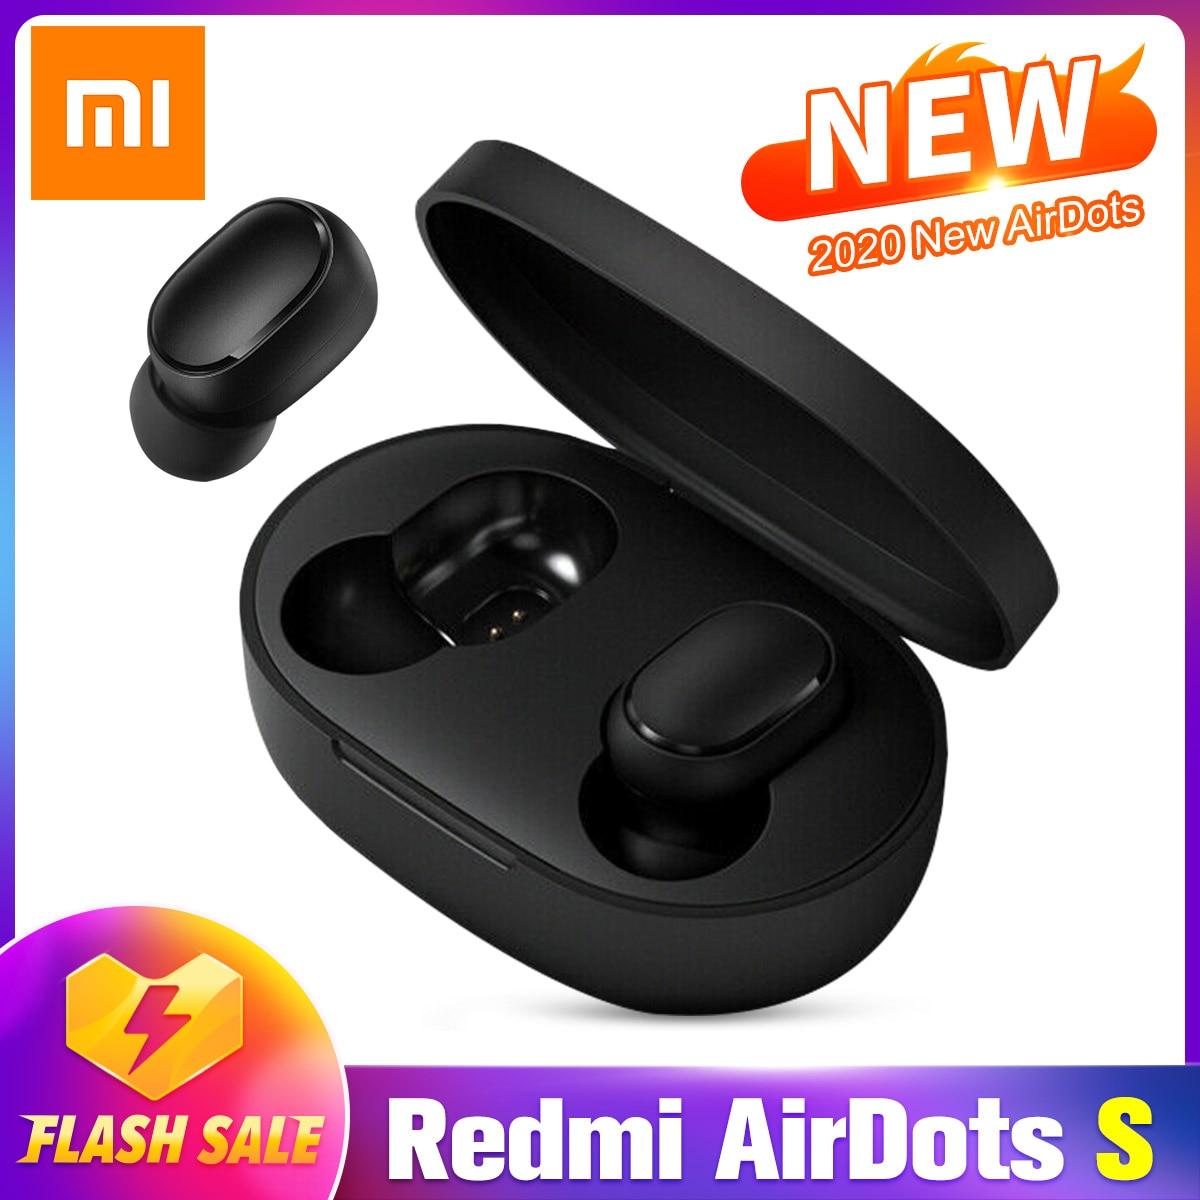 Redmi Xiaomi Airdots TWS auriculares bluetooth inalámbricos 5,0 AI Control de juegos auriculares con micrófono reducción de ruido actualización AirDots S